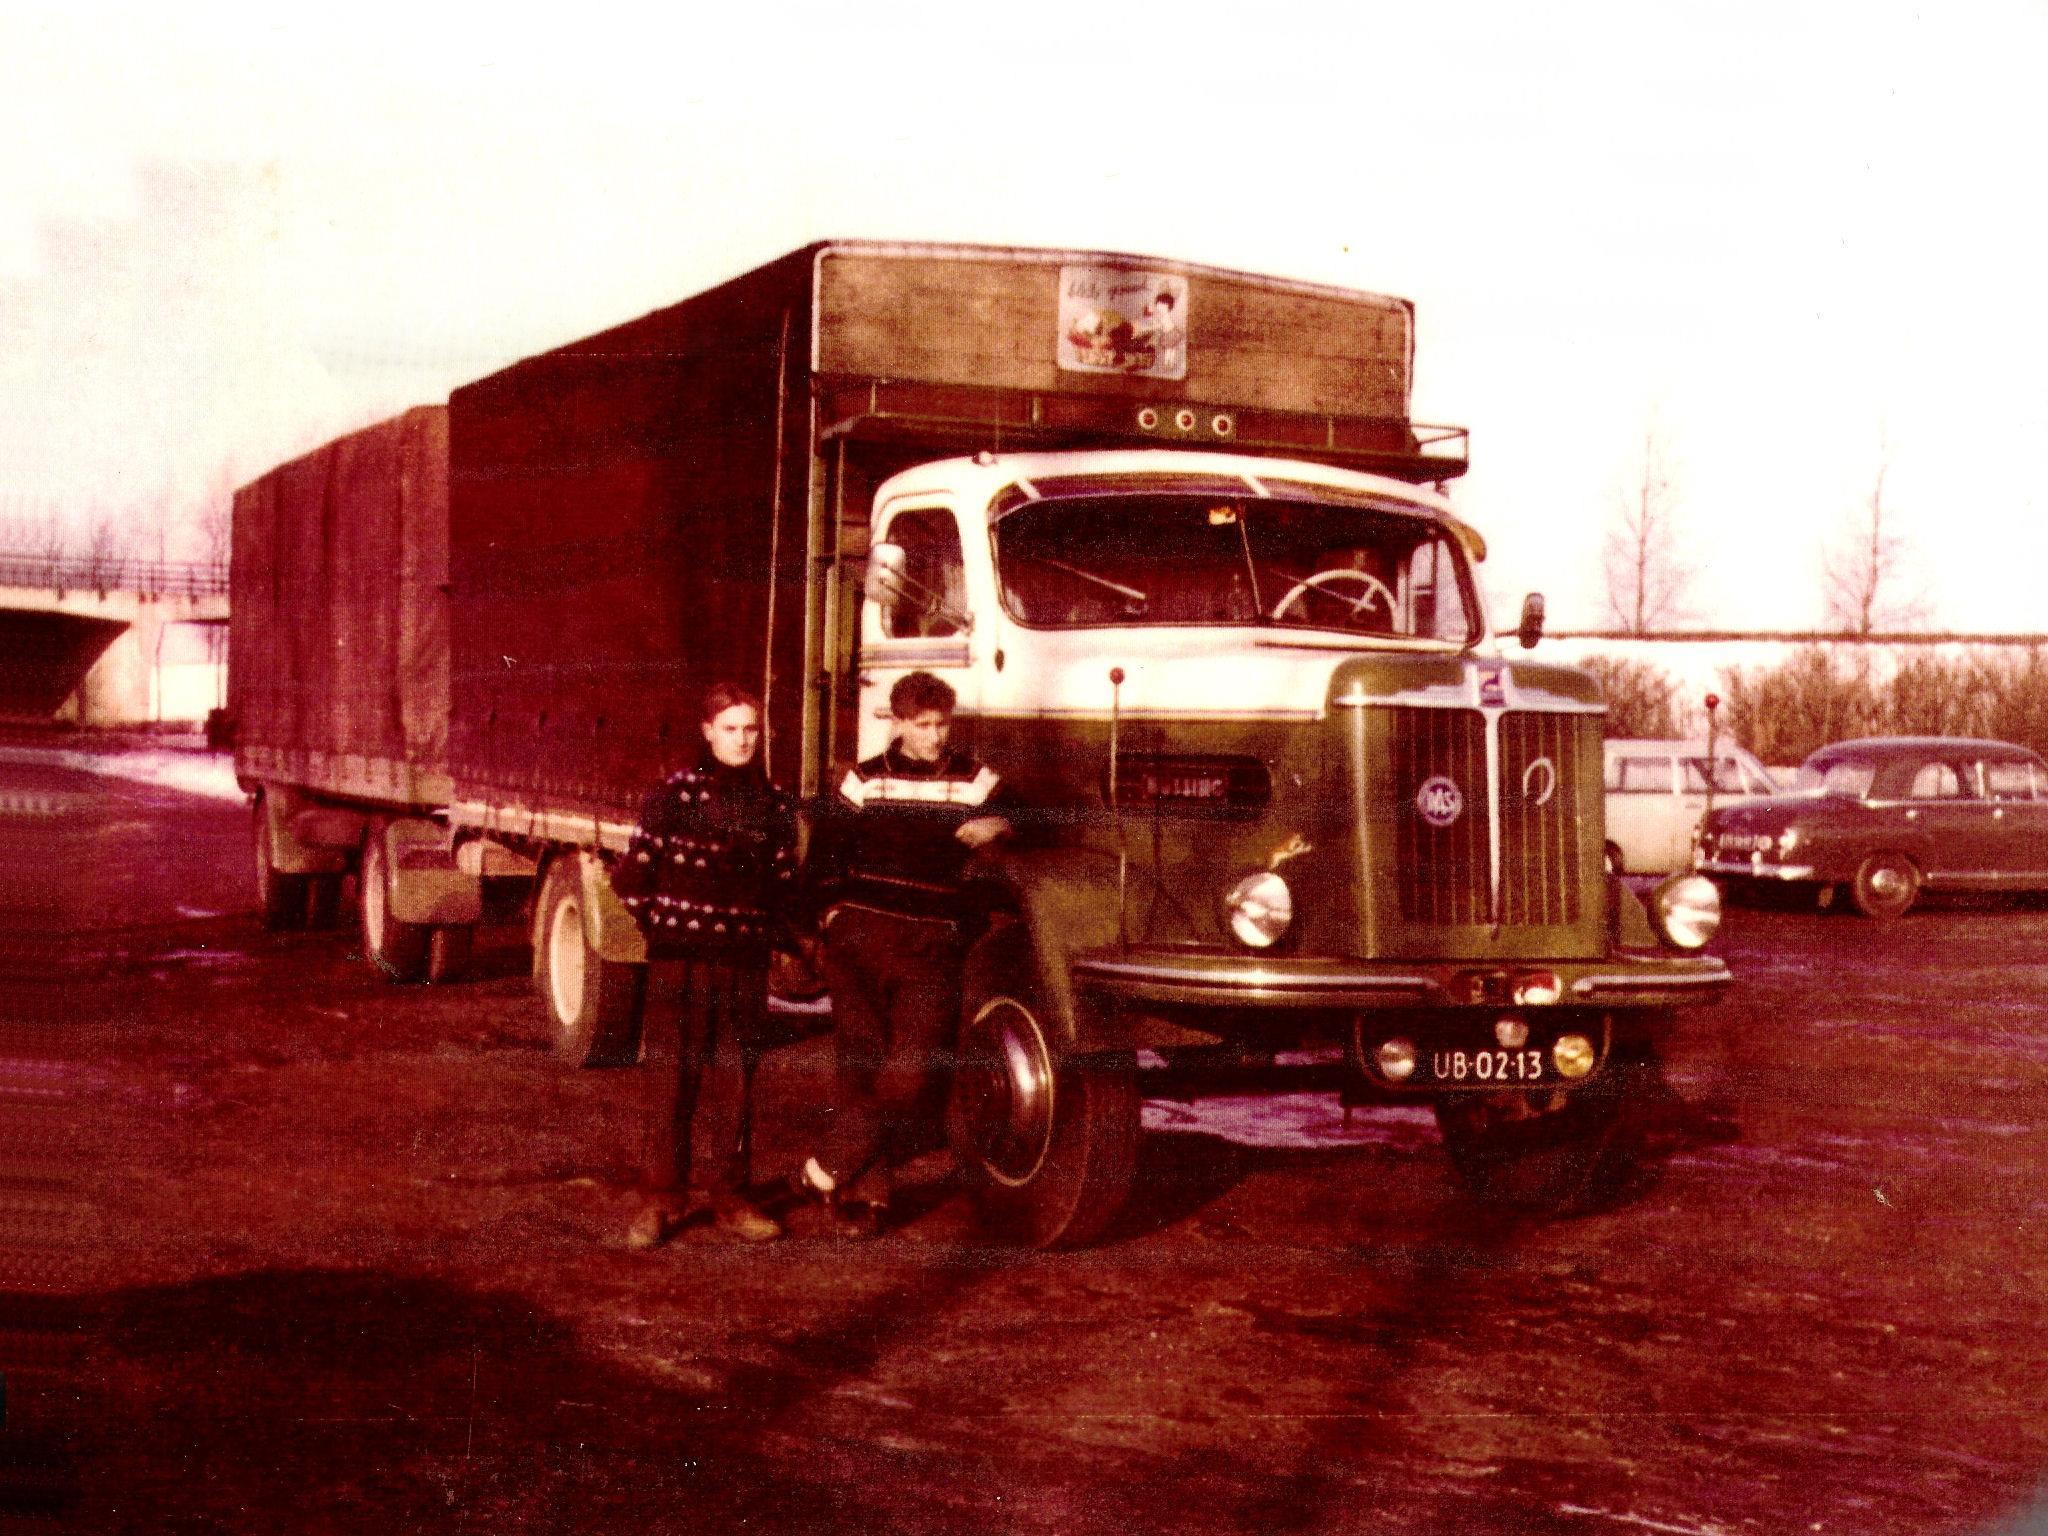 Timmermans-Transport-Veen-John-van-Andel-archief-4